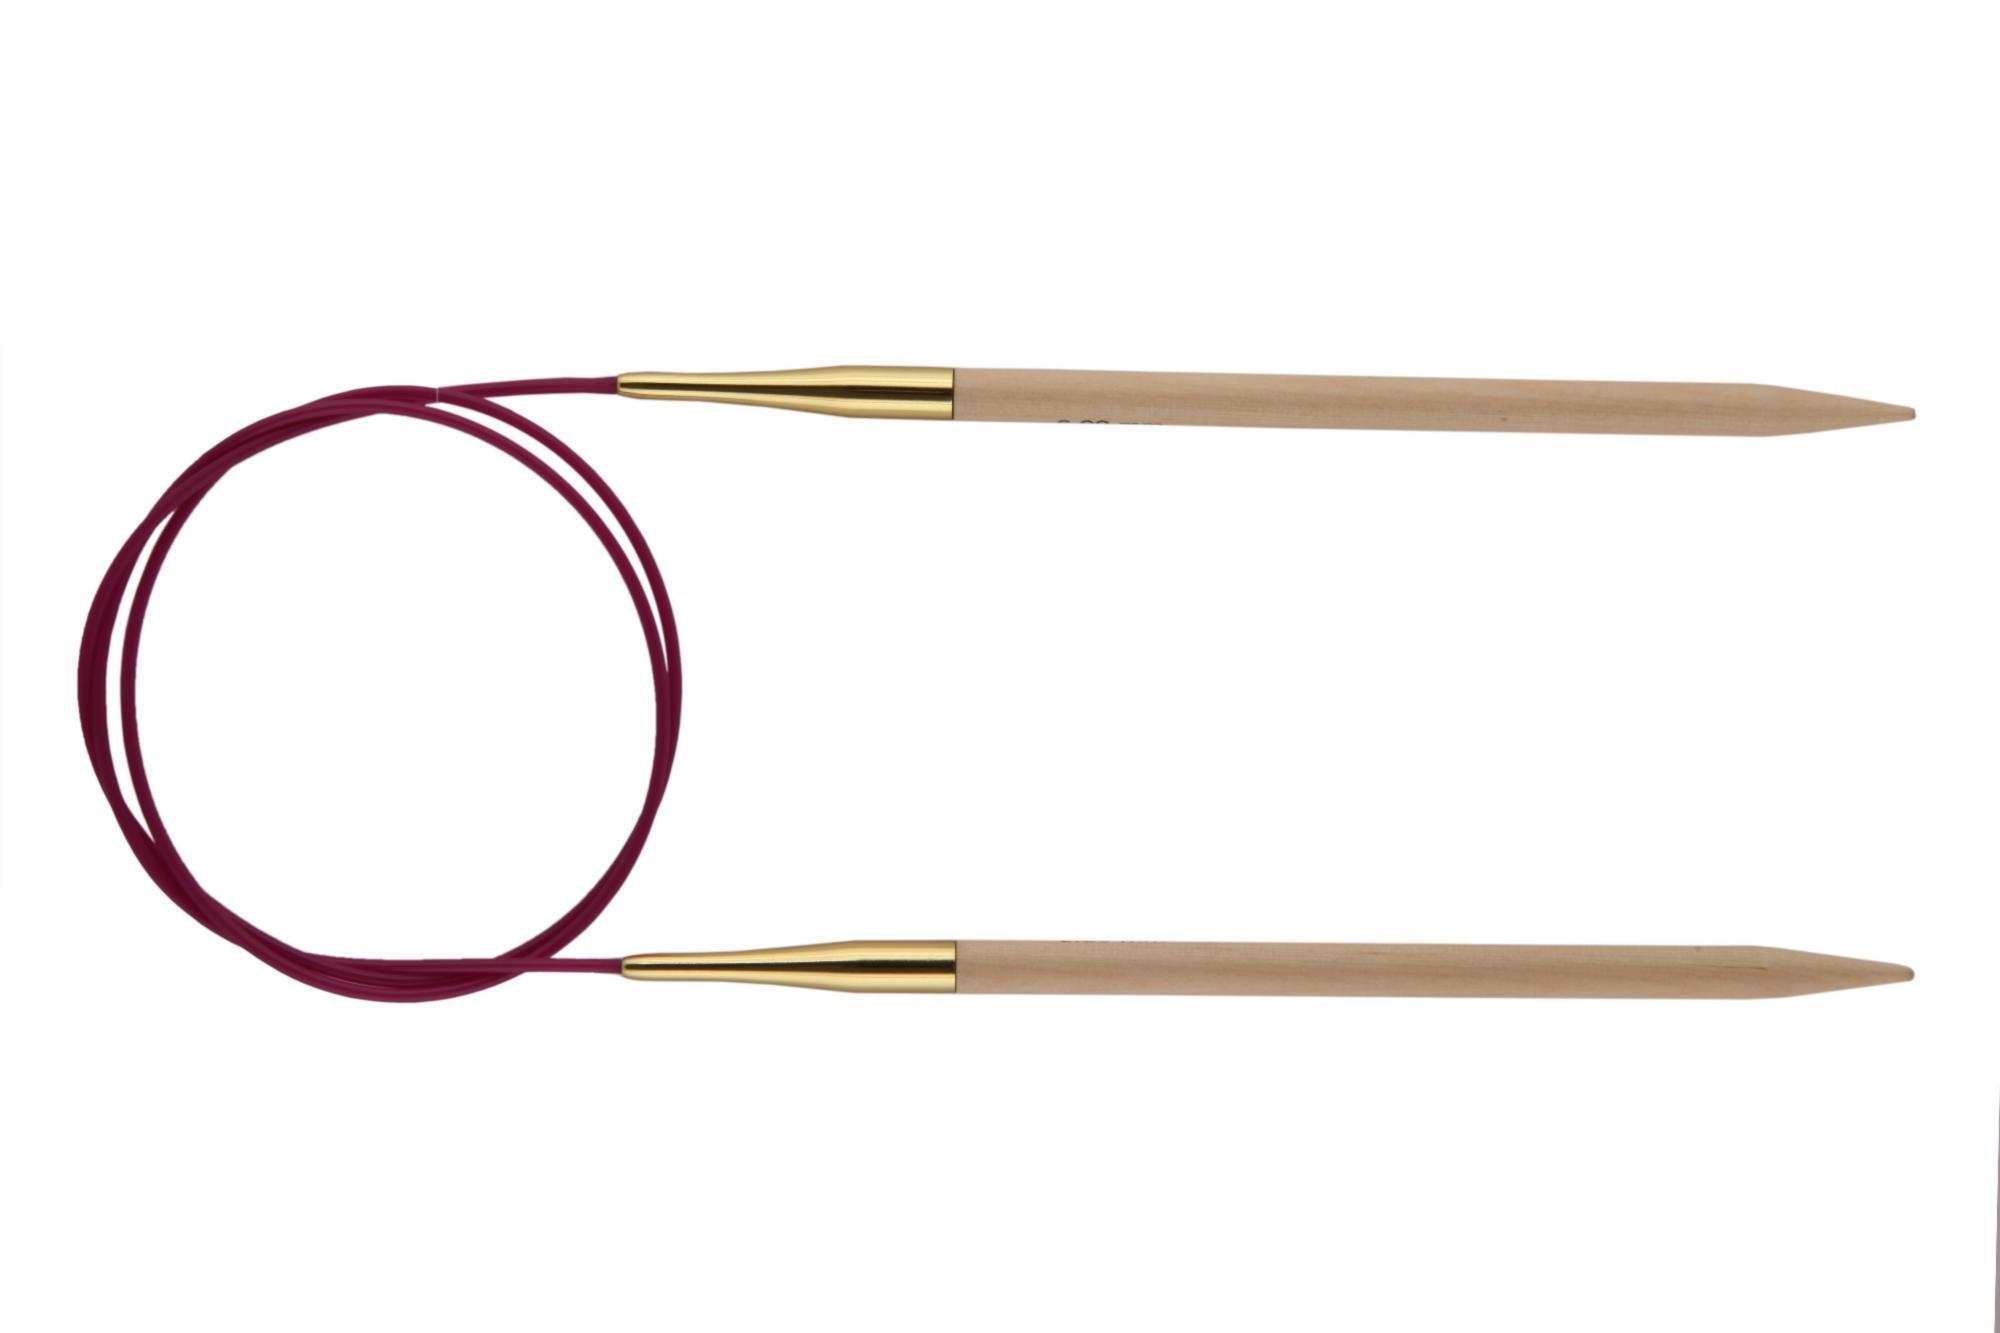 Спицы круговые 100 см Basix Birch Wood KnitPro, 35616, 3.25 мм